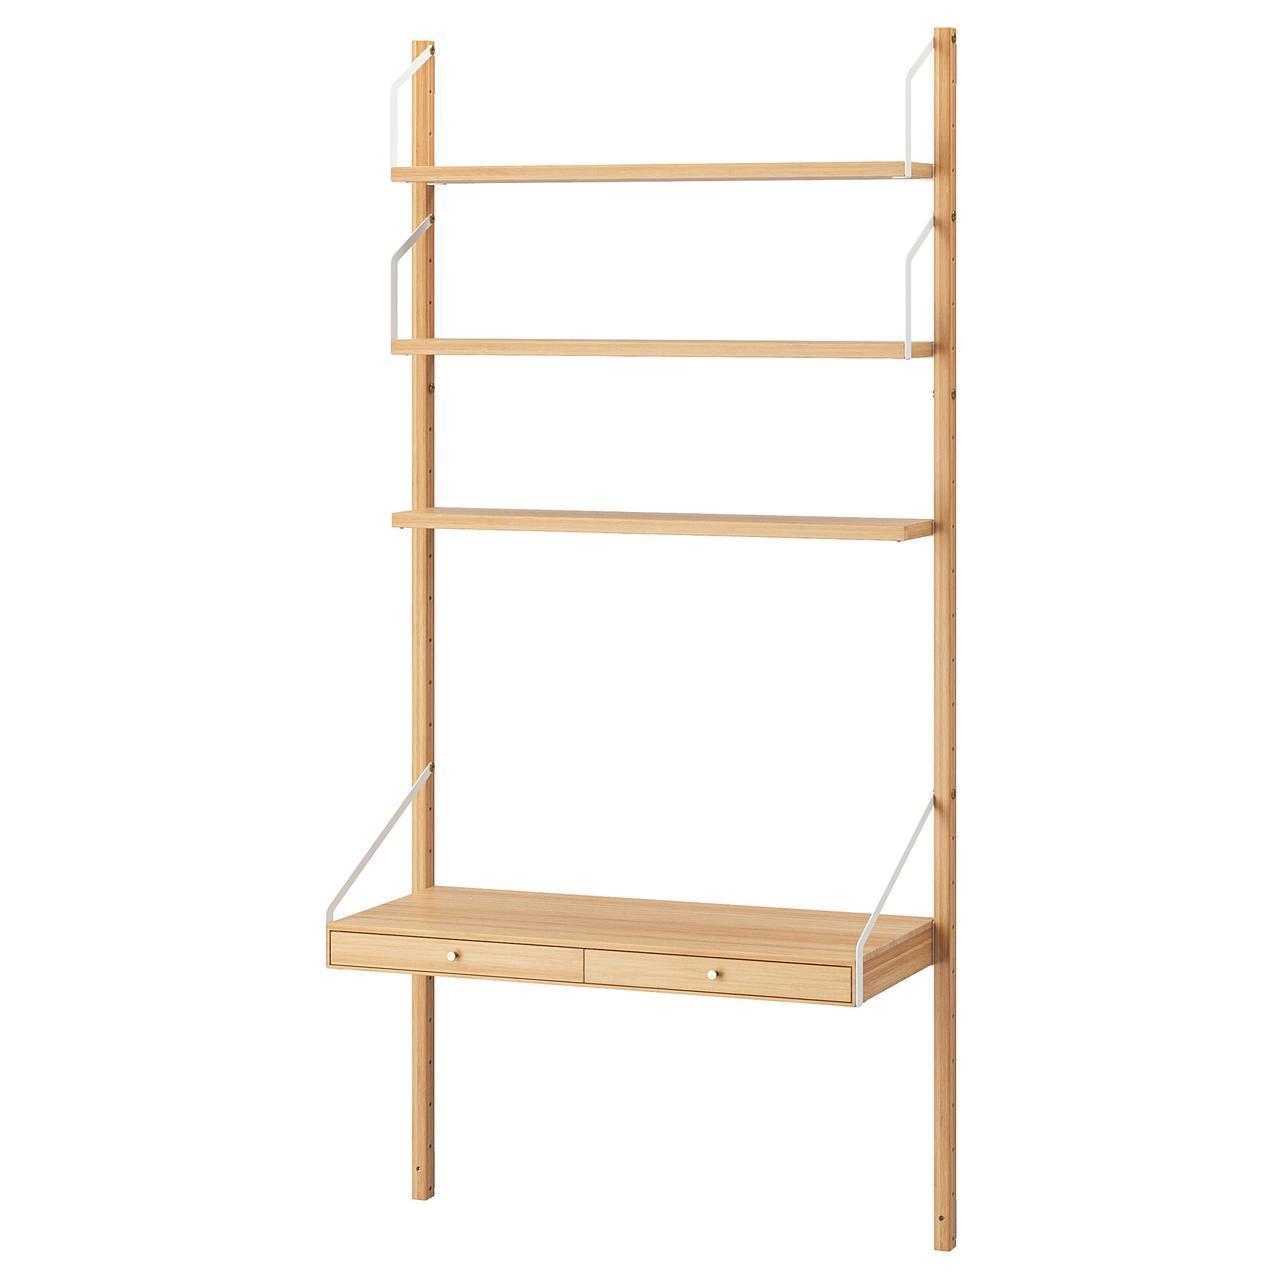 IKEA SVALNAS Настенный стол с полками, бамбук  (292.217.65)